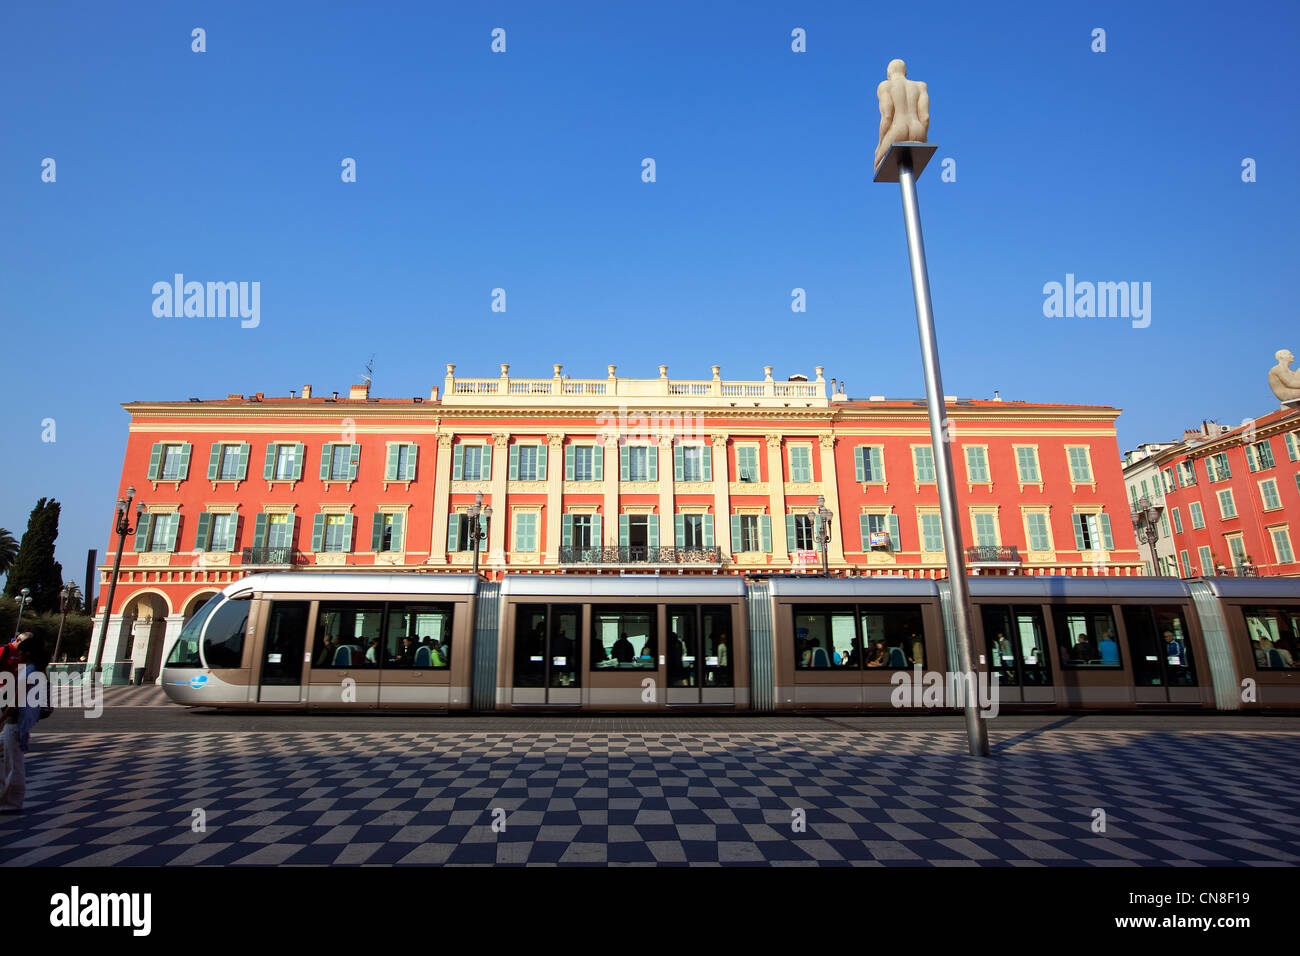 France, Alpes Maritimes, Nice, Place Massena, the tram - Stock Image